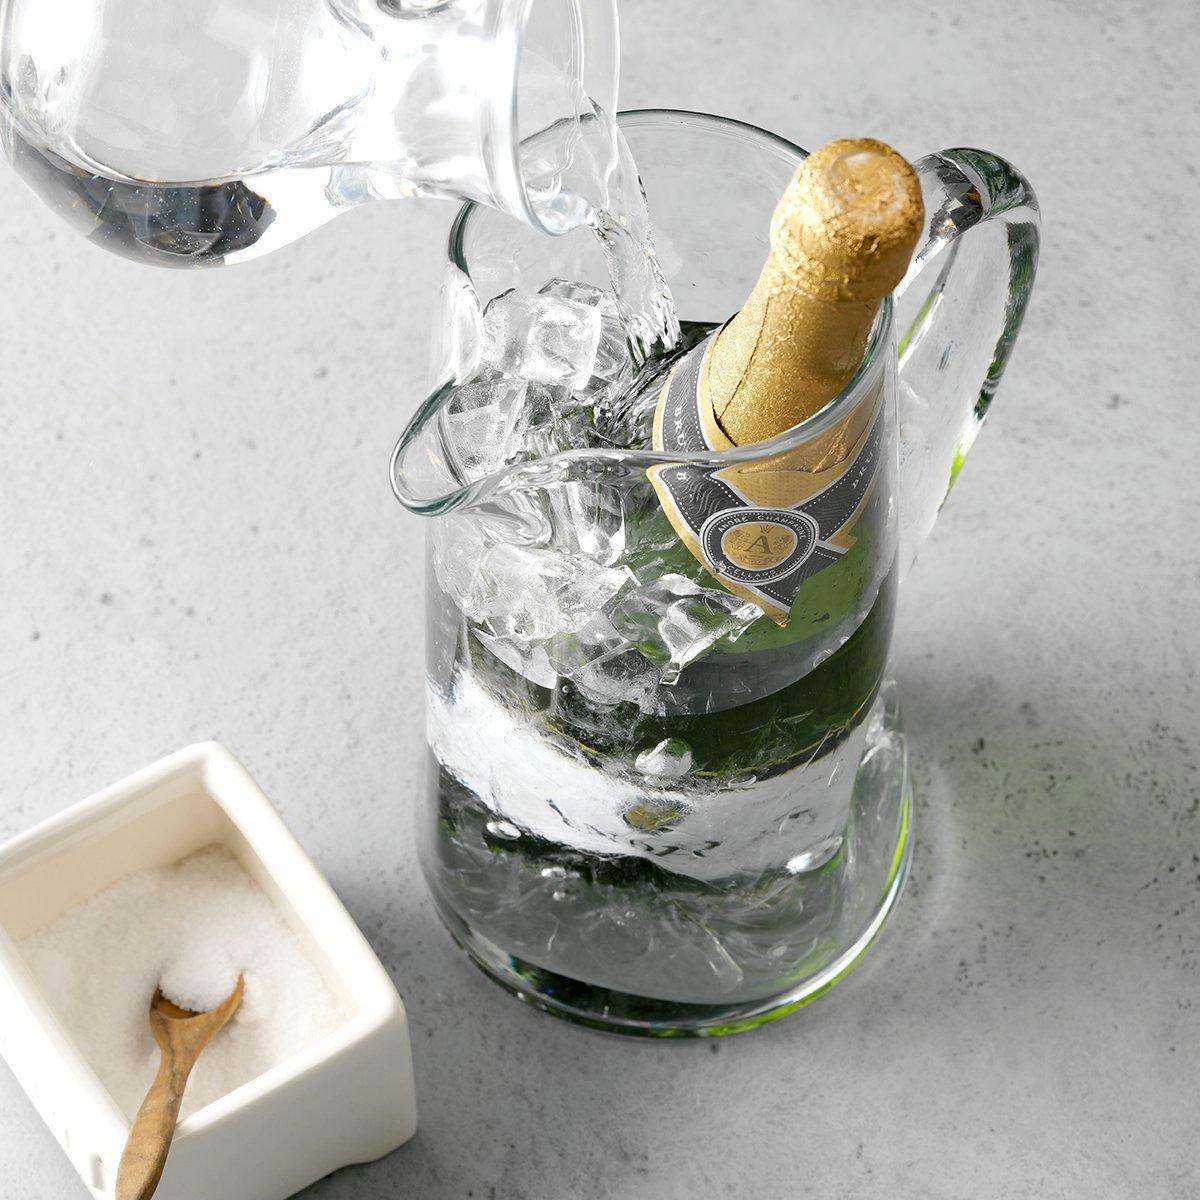 THGKH19, Kitchen Hack Chilling Wine Bottle